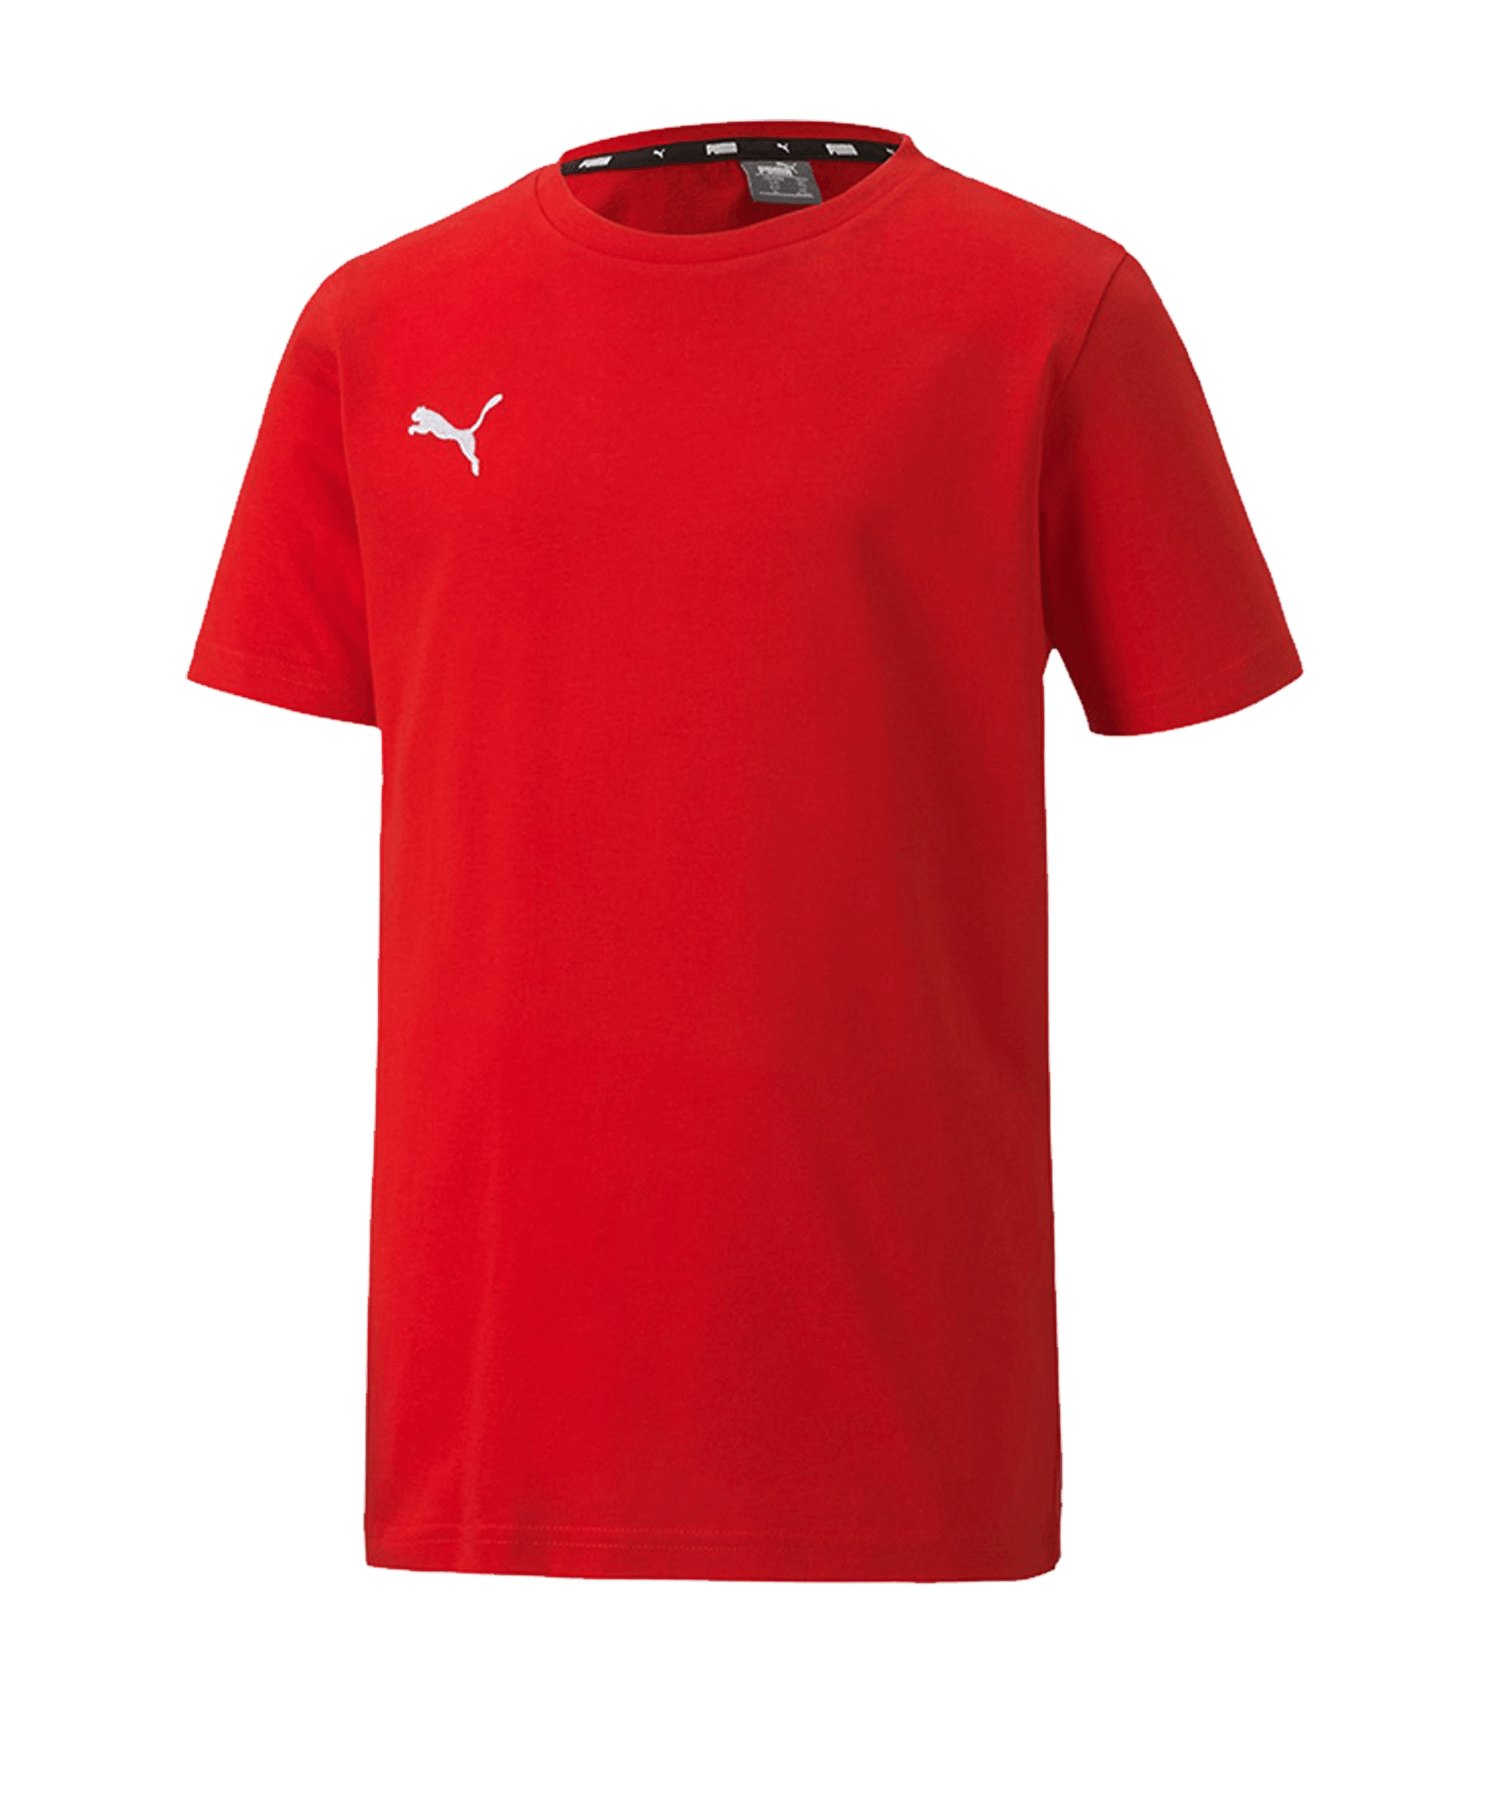 PUMA teamGOAL 23 Casuals Tee T-Shirt Kids Rot F01 - rot